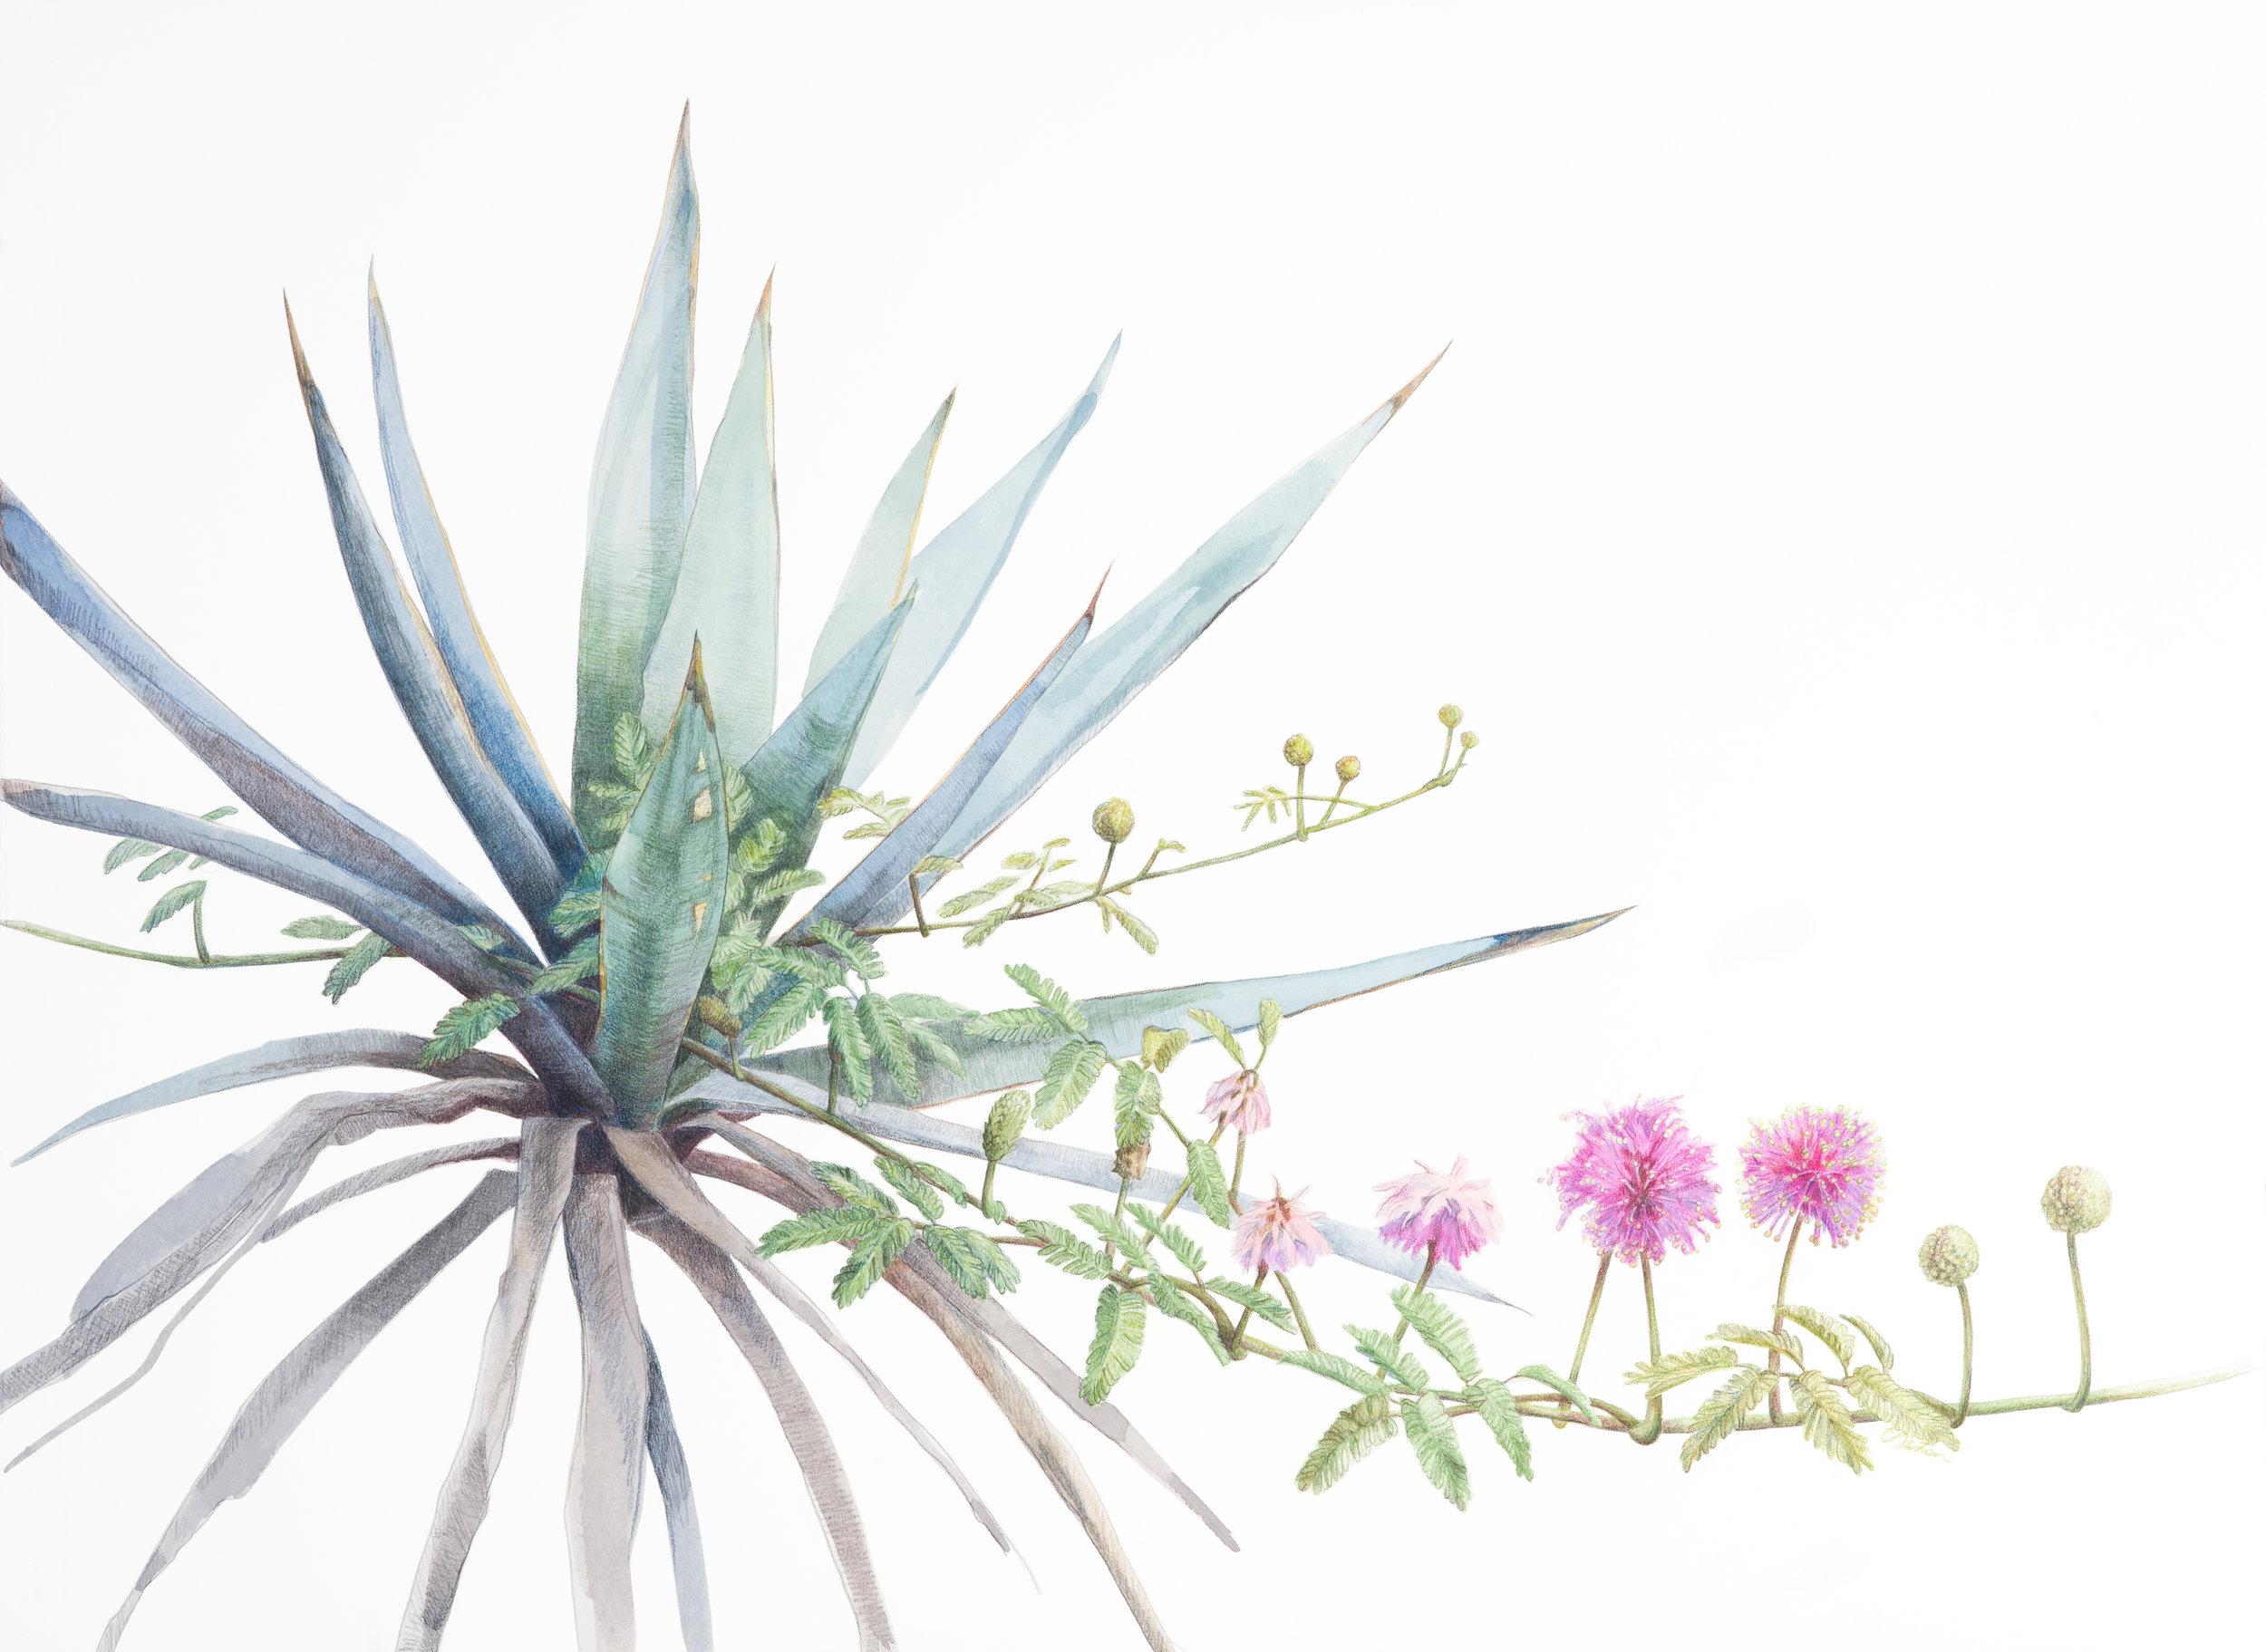 agave-and-sensitiveplant-drawing.jpg